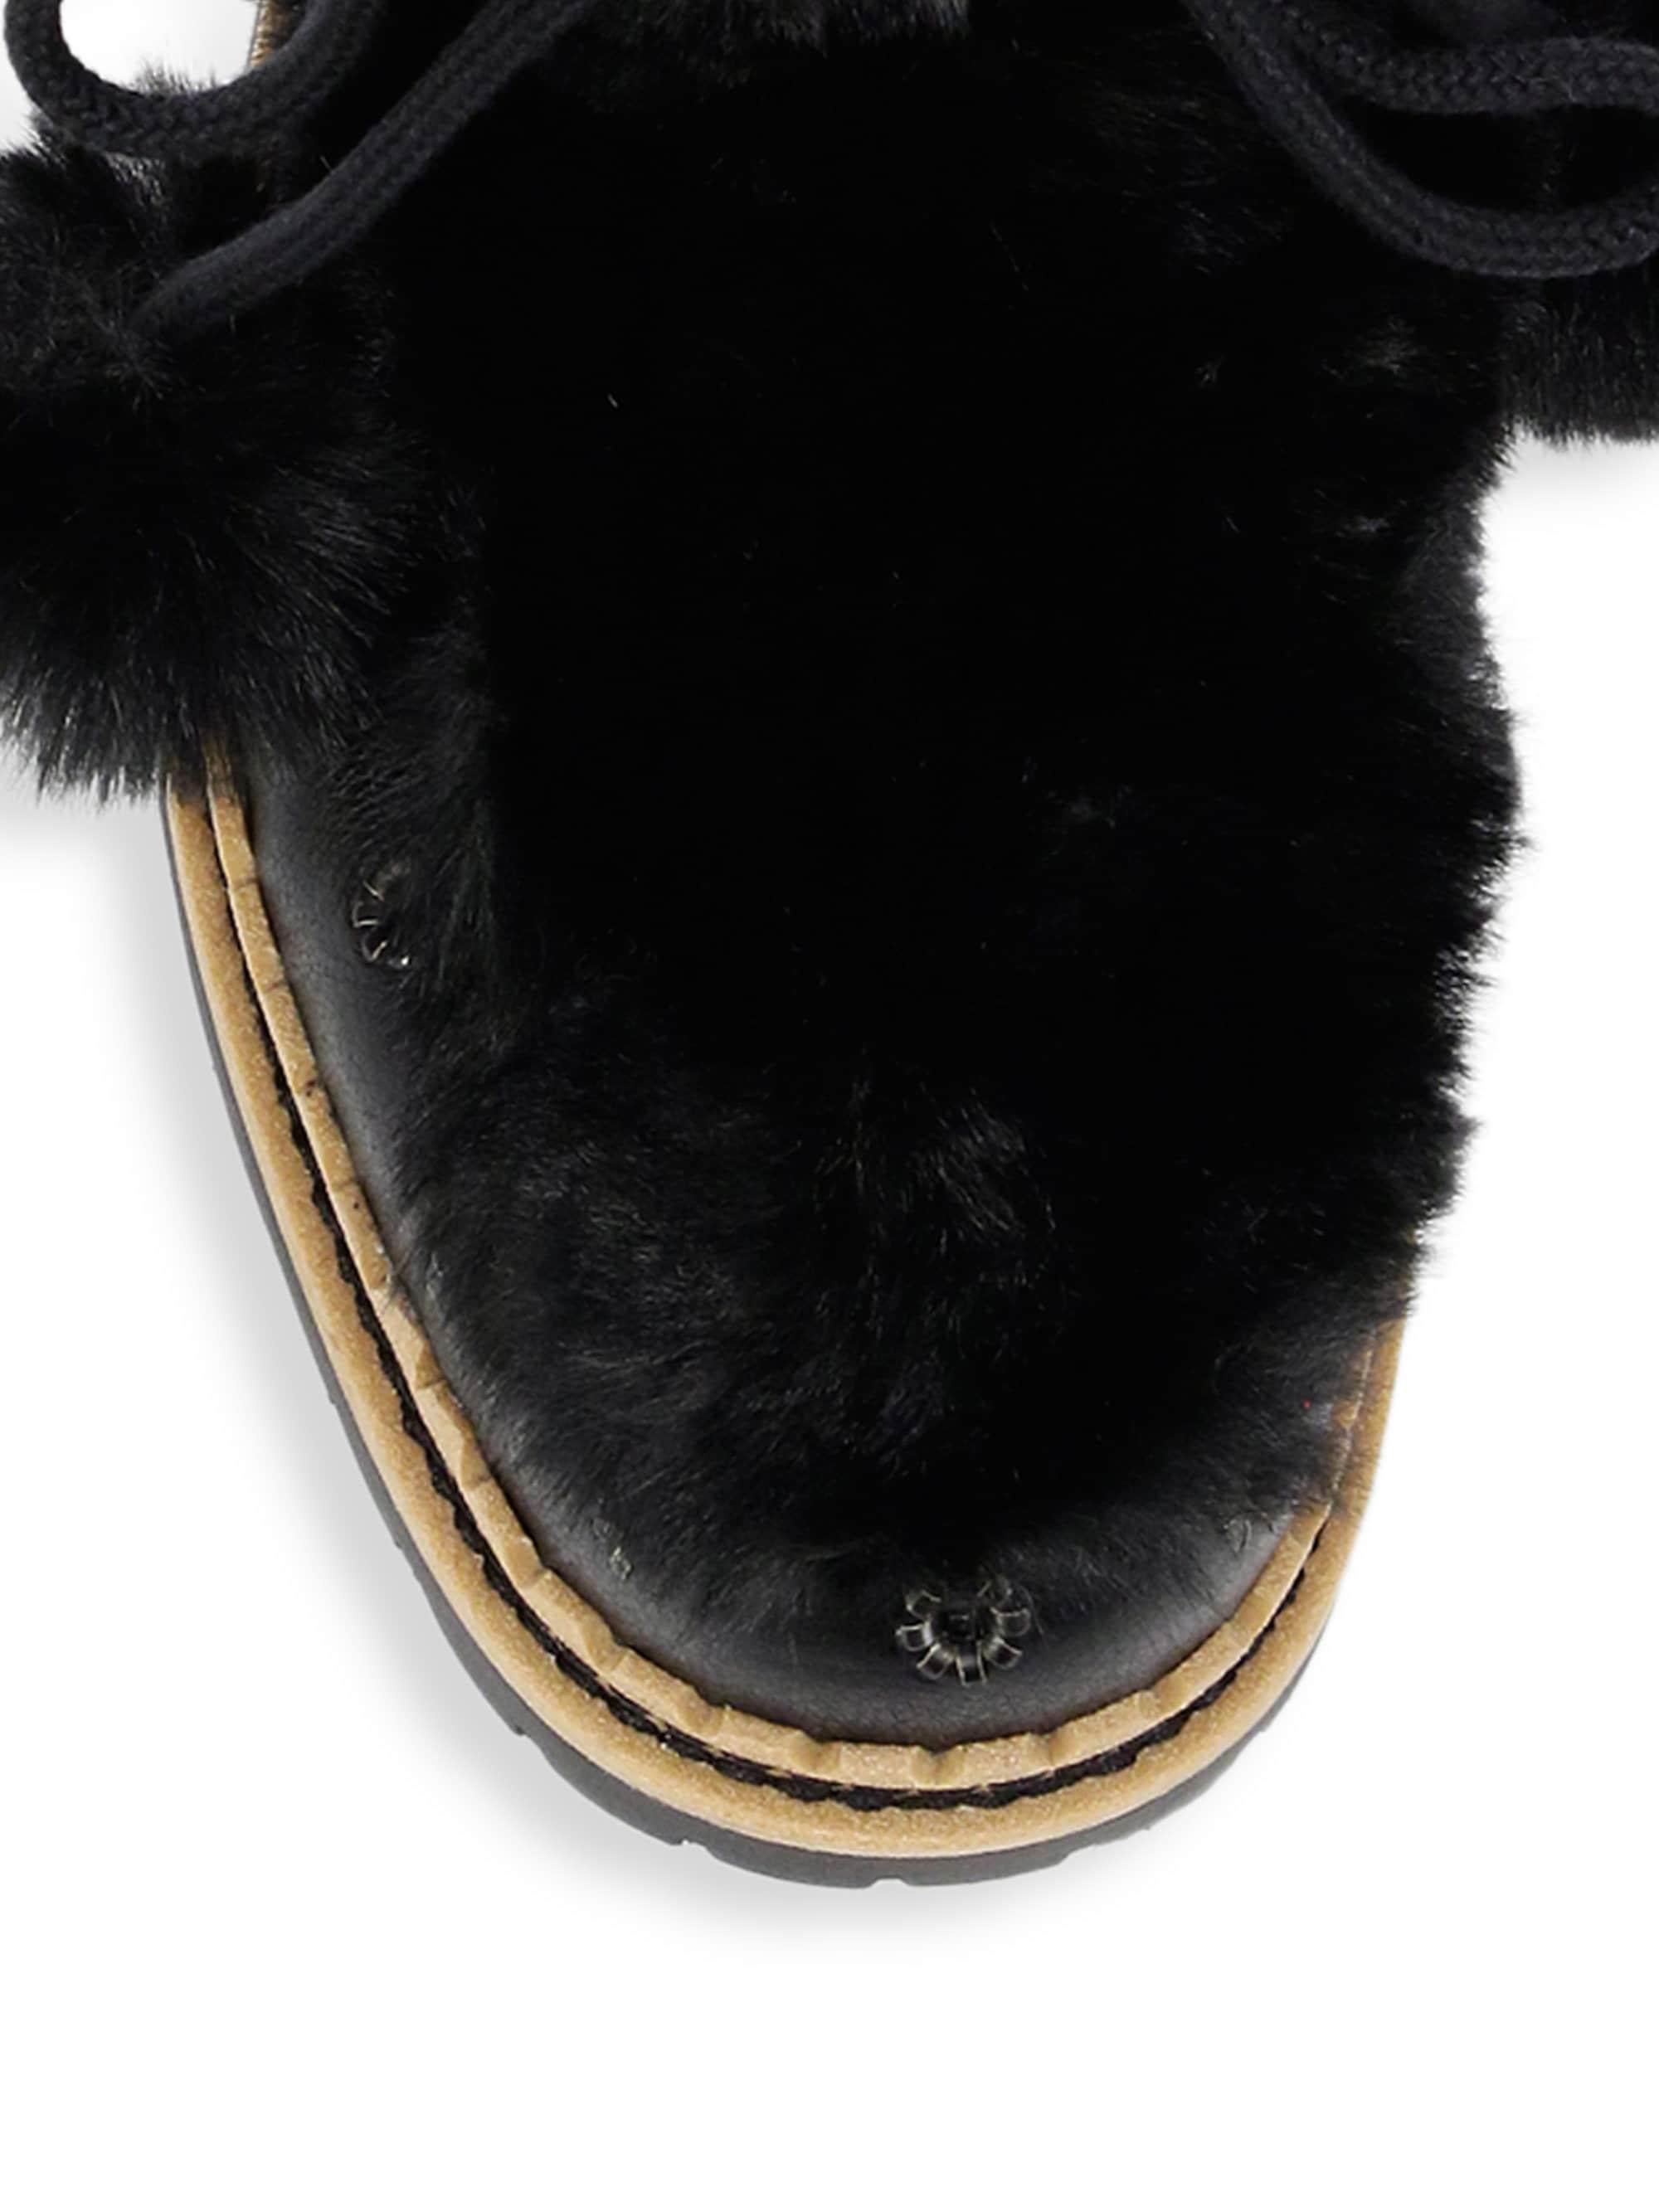 e4ebc057834d9e Lyst - Sam Edelman Women s Blanche Faux Fur And Leather Tassel Boots -  Black - Size 5.5 in Black - Save 60%